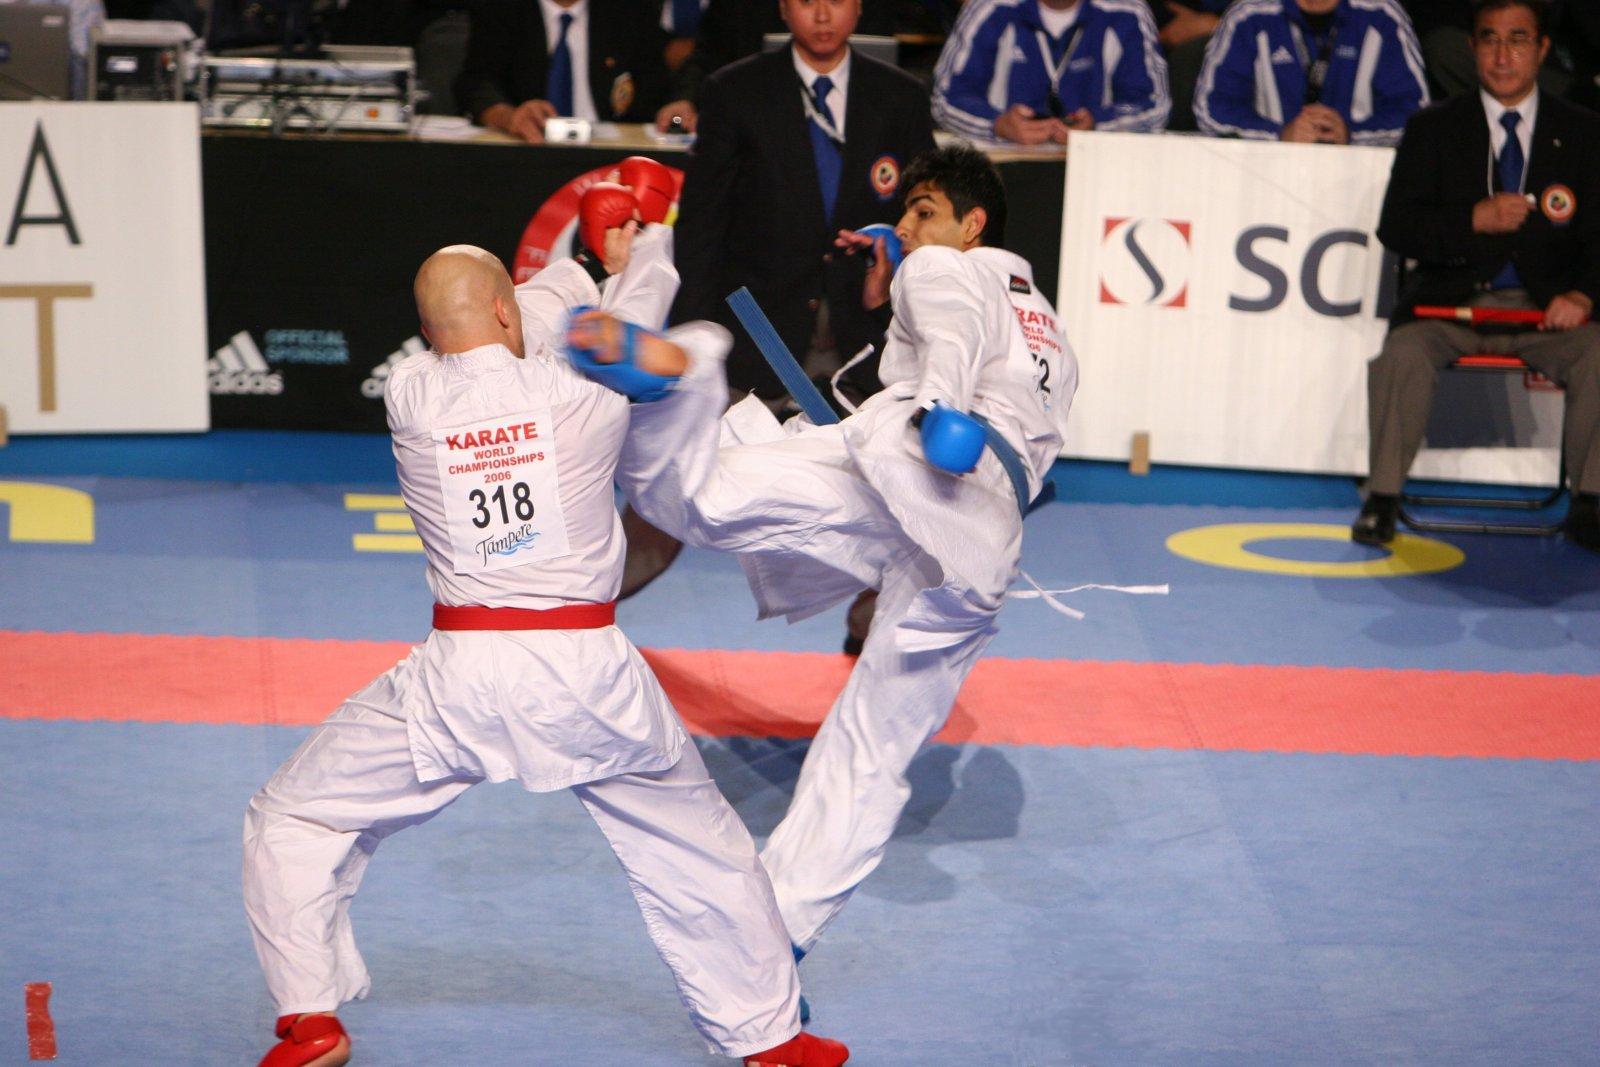 large.Karate_Rospersonal.jpg.a18f90e0865